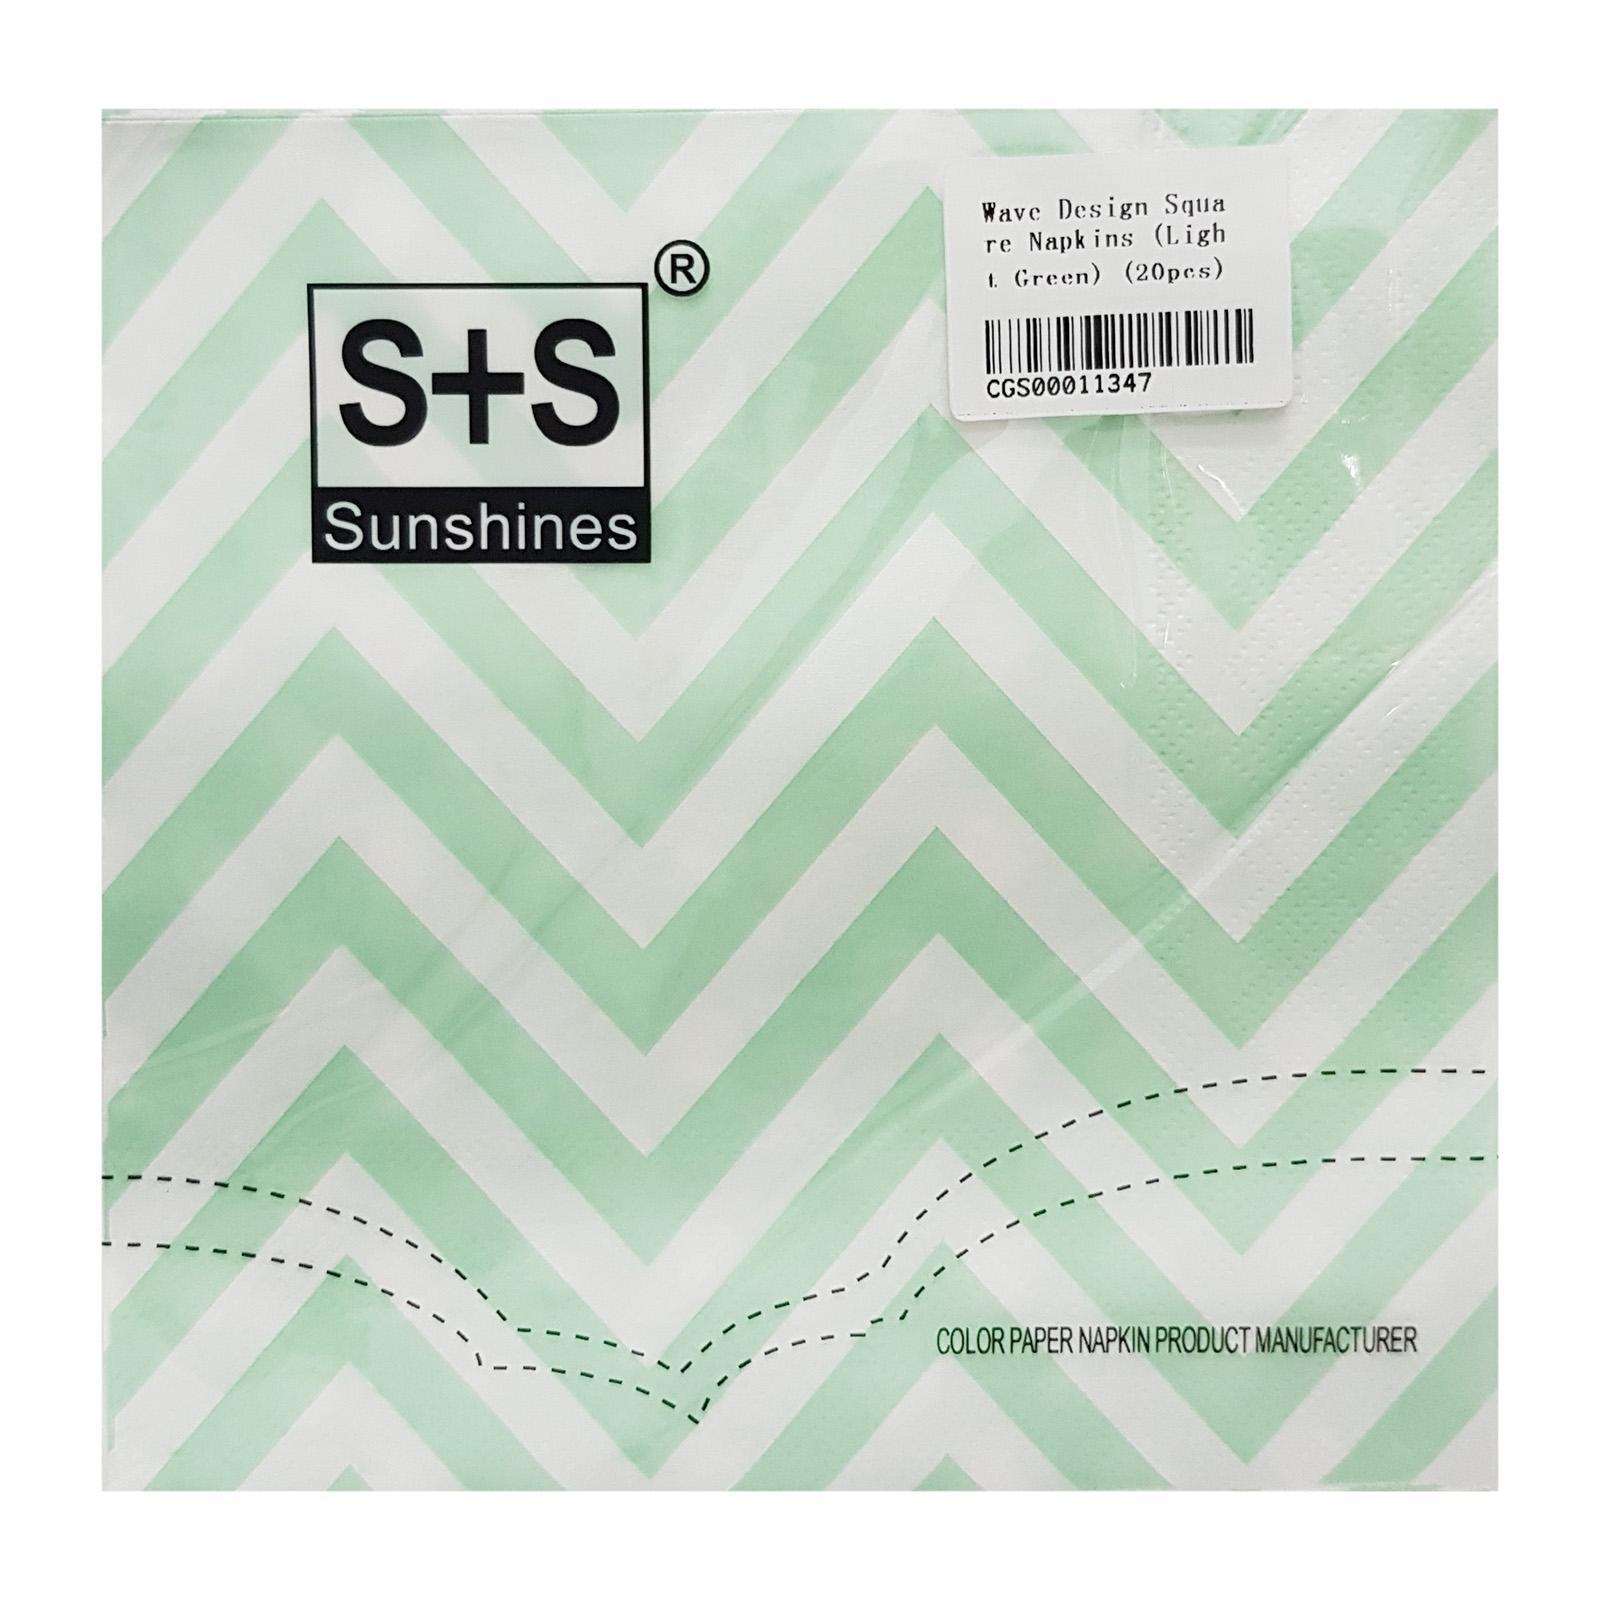 CGS Wave Design Square Napkins (Light Green) (20 PCS)